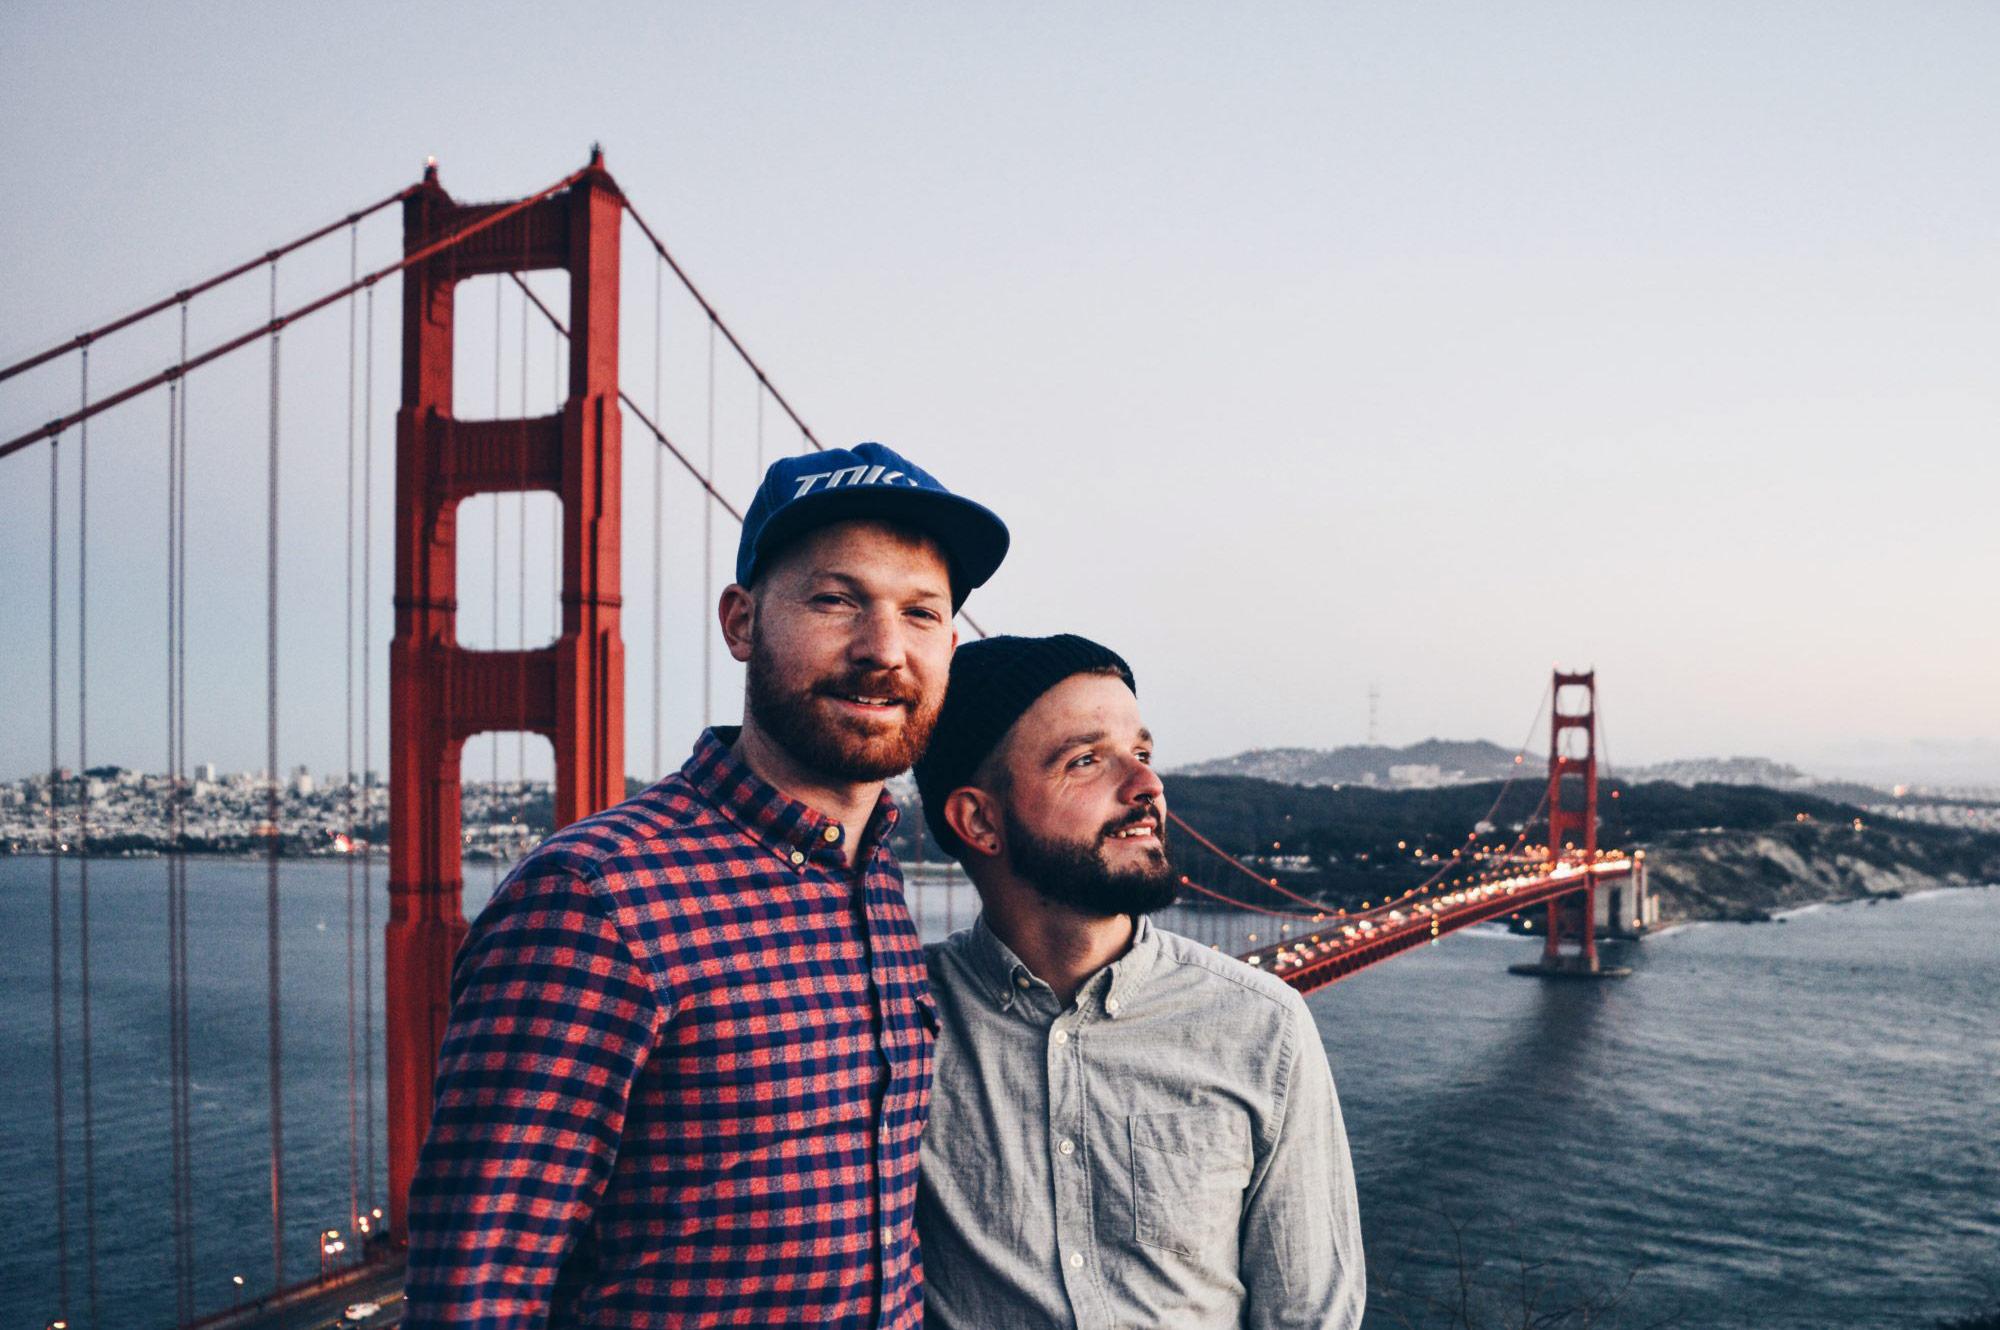 Gay Travel Blogger Karl & Daan vor der Golden Gate Bridge in San Francisco Top 13 Highlights Road Trip South West USA © CoupleofMen.com